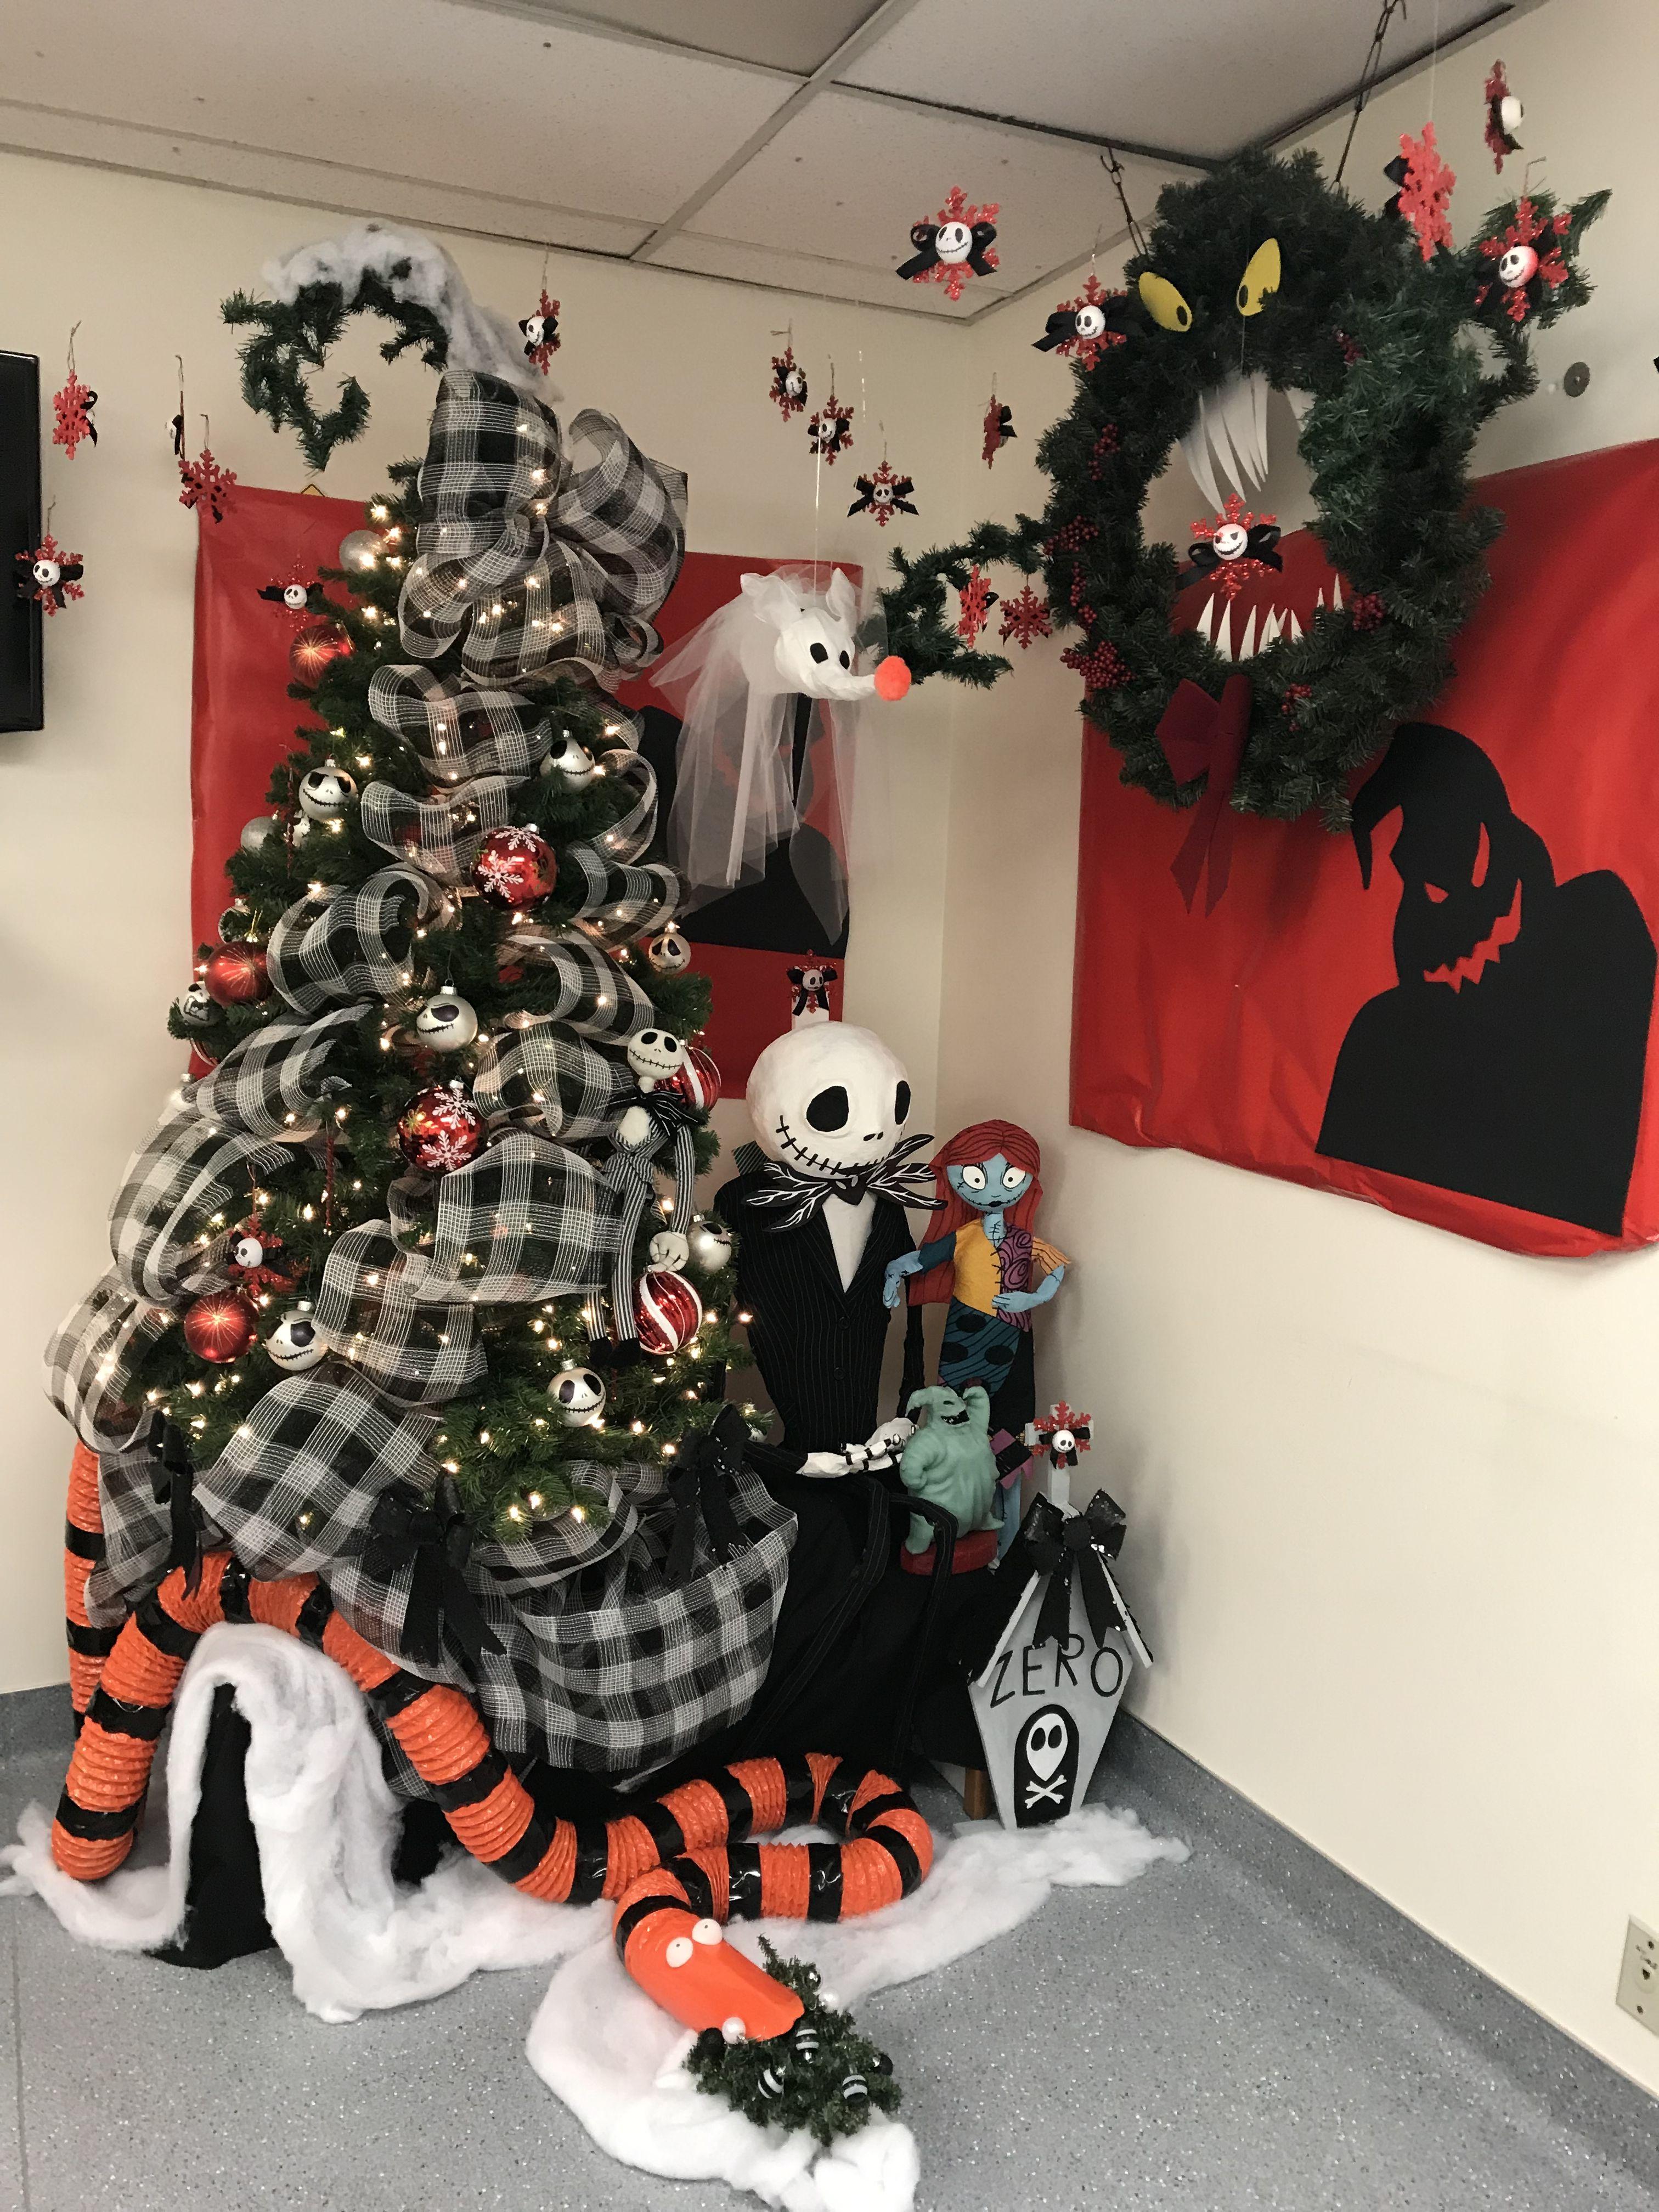 Nightmare Before Christmas Tree Nightmare Before Christmas Tree Nightmare Before Christmas Decorations Nightmare Before Christmas